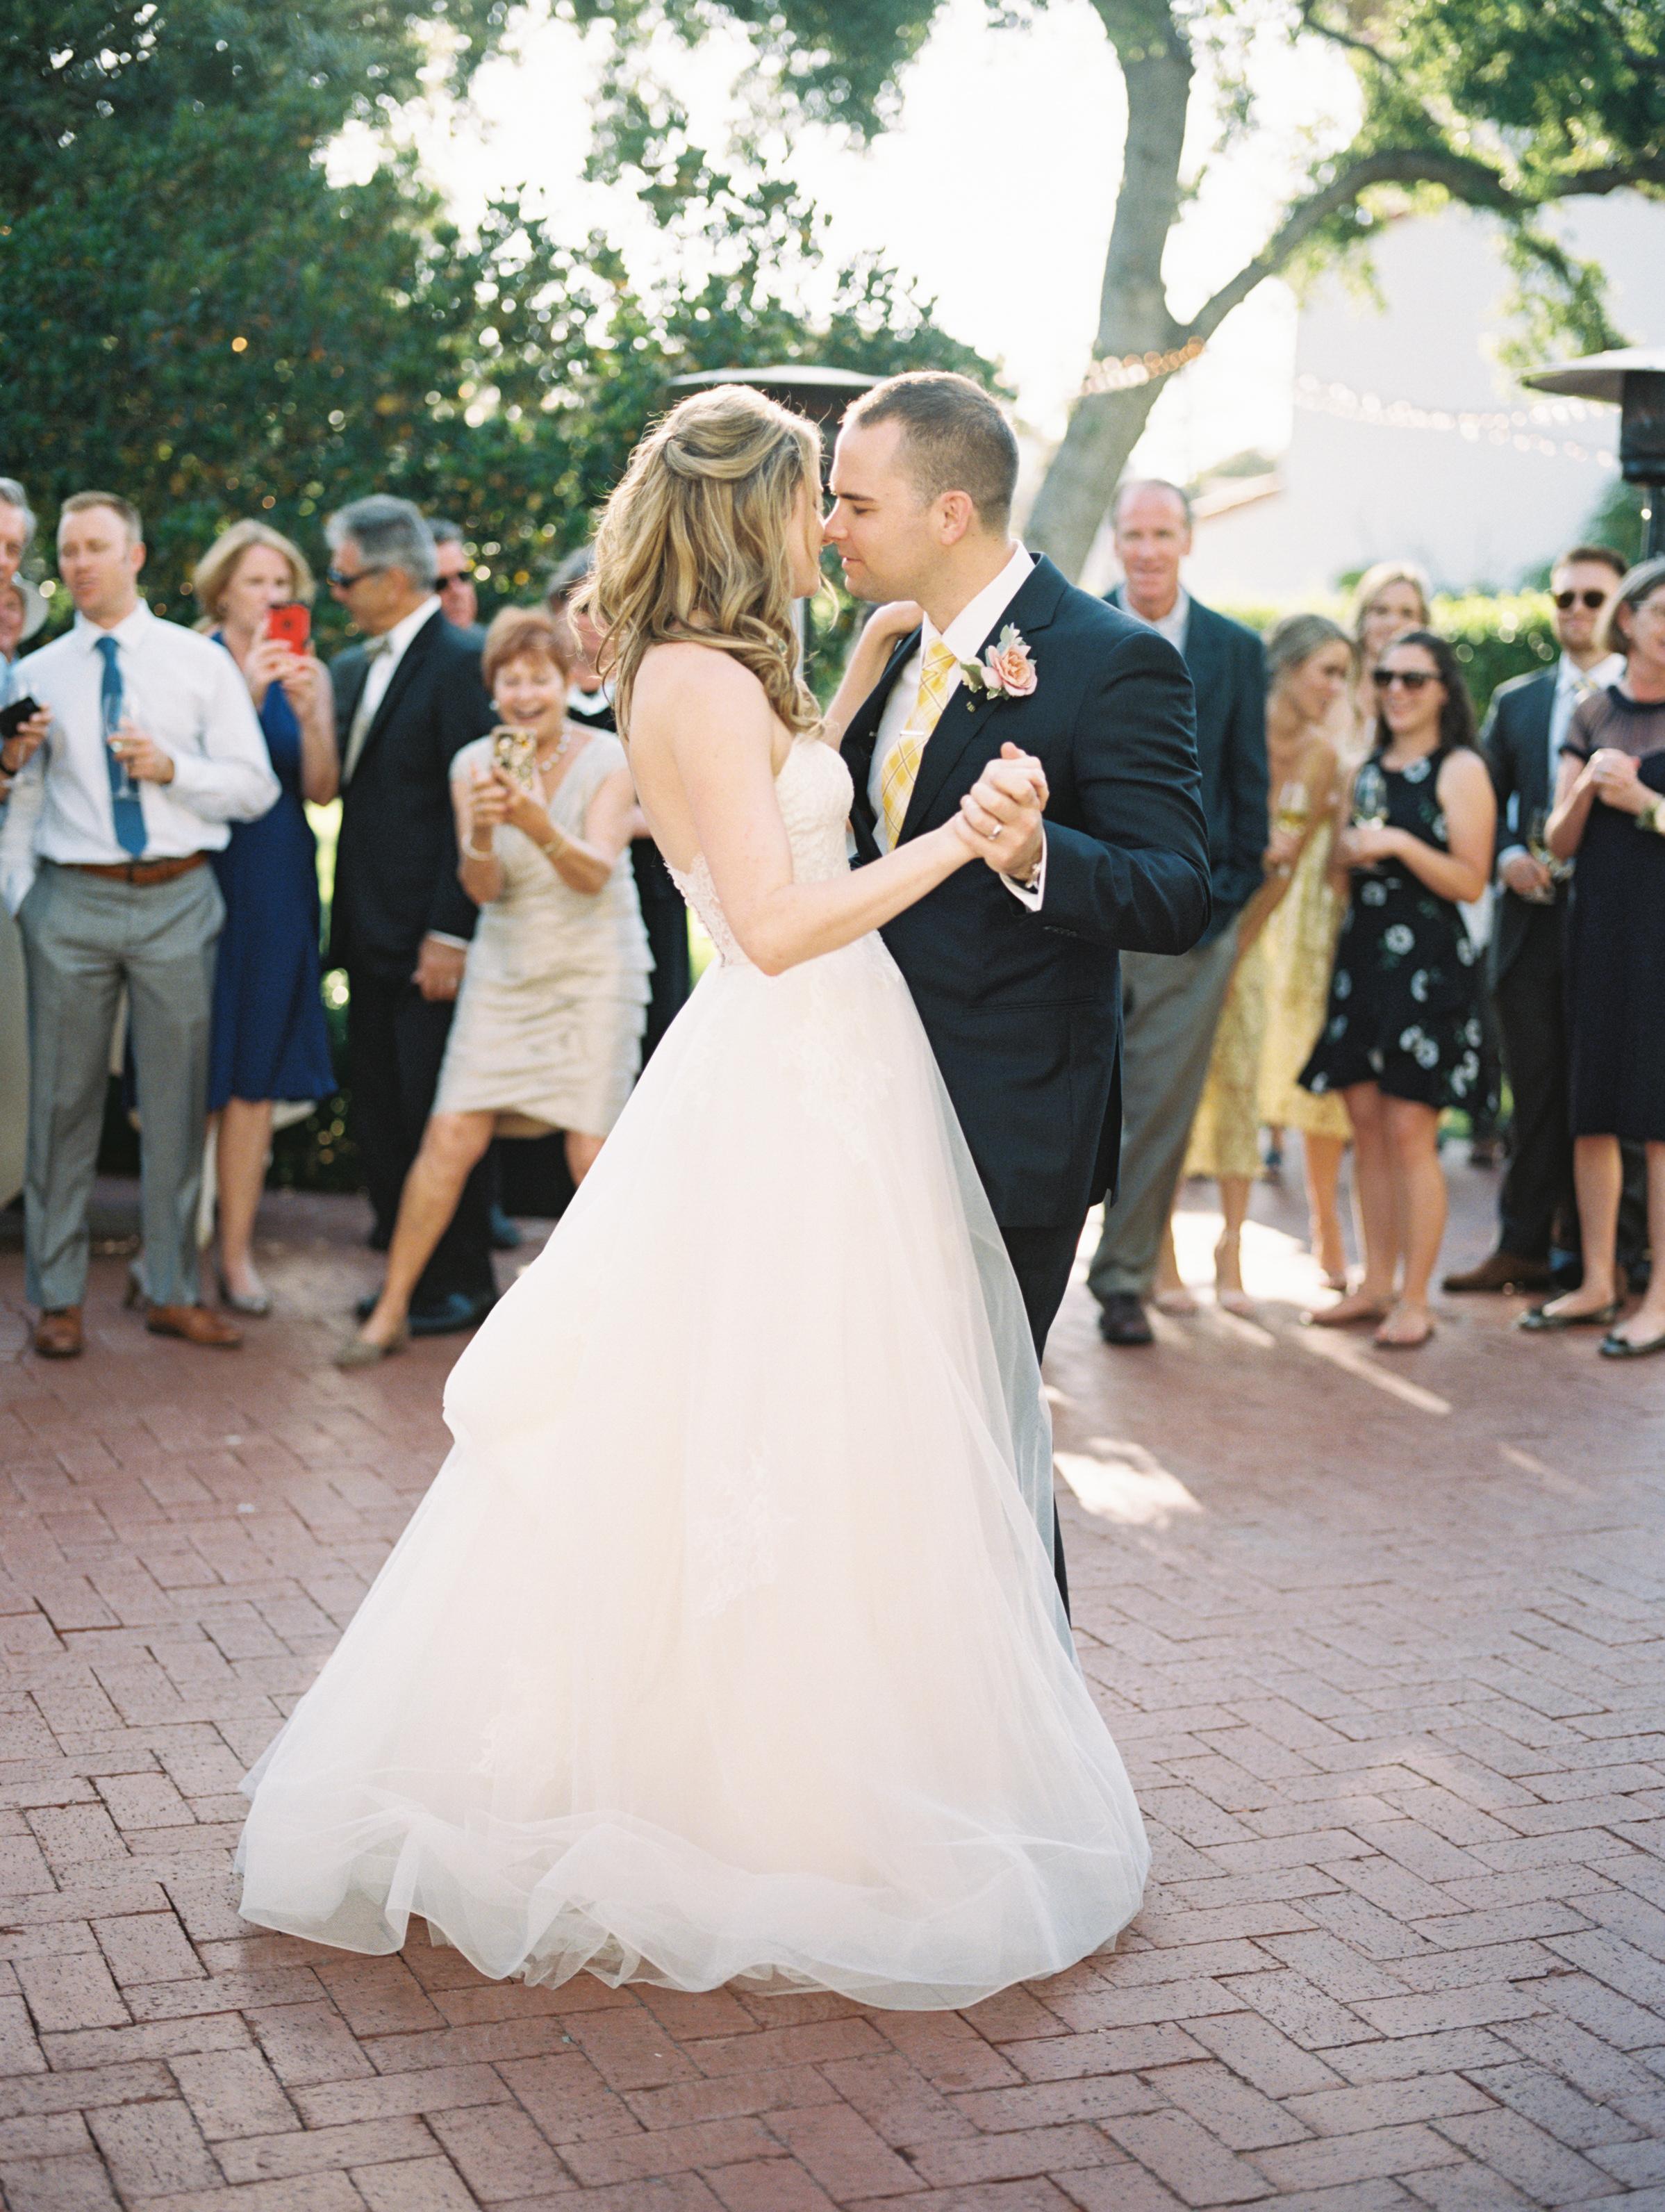 www.santabarbarawedding.com | Ryanne Bee Photography | The Santa Barbara Club | The Wedding Expert DJ | Bride and Groom Share First Dance